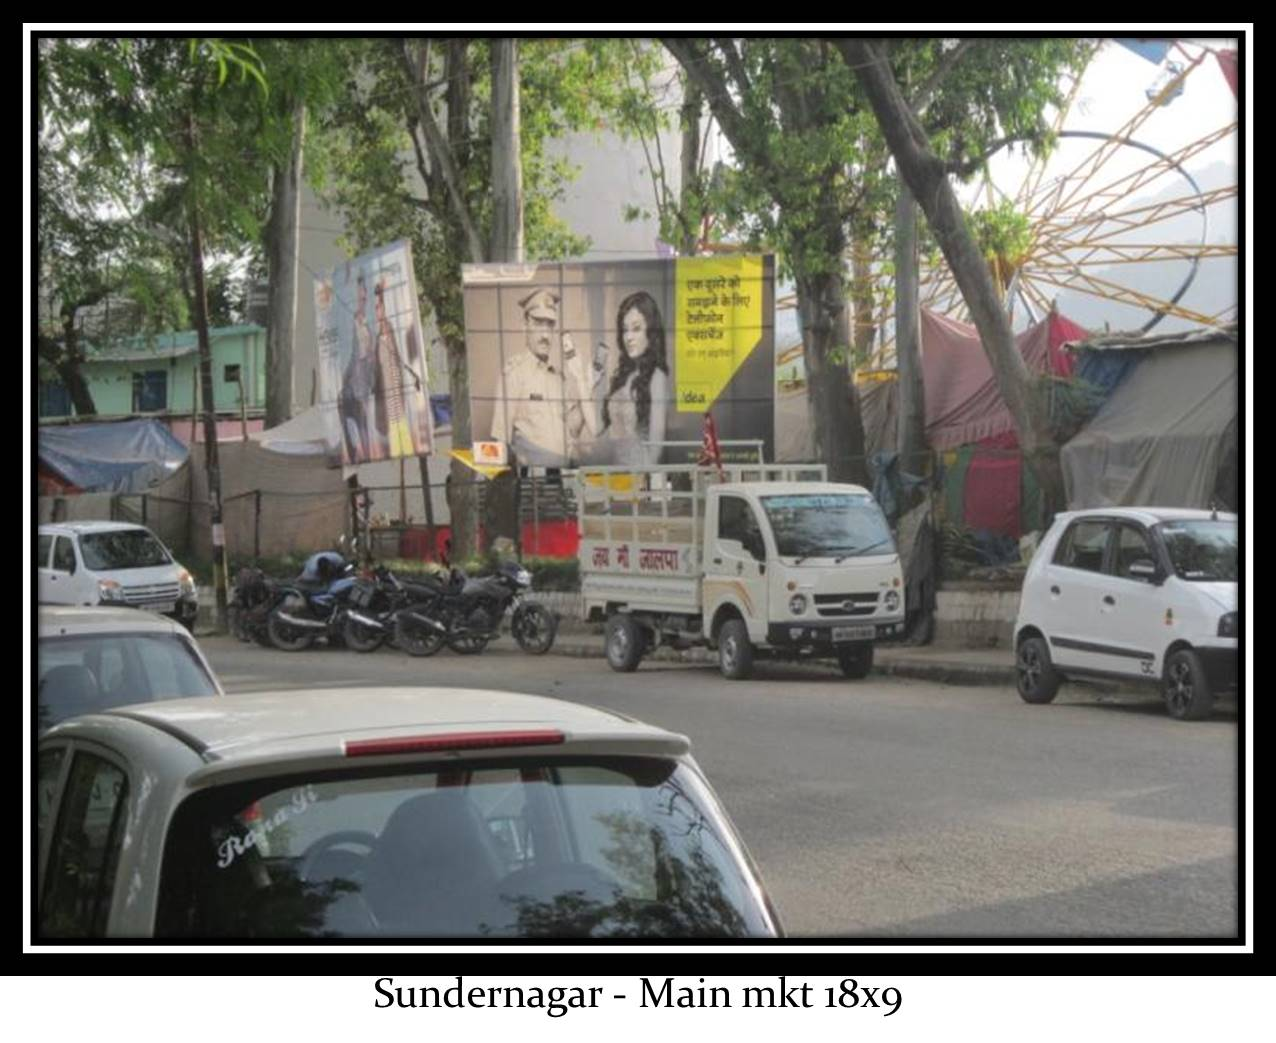 Main market, Sundar Nagar